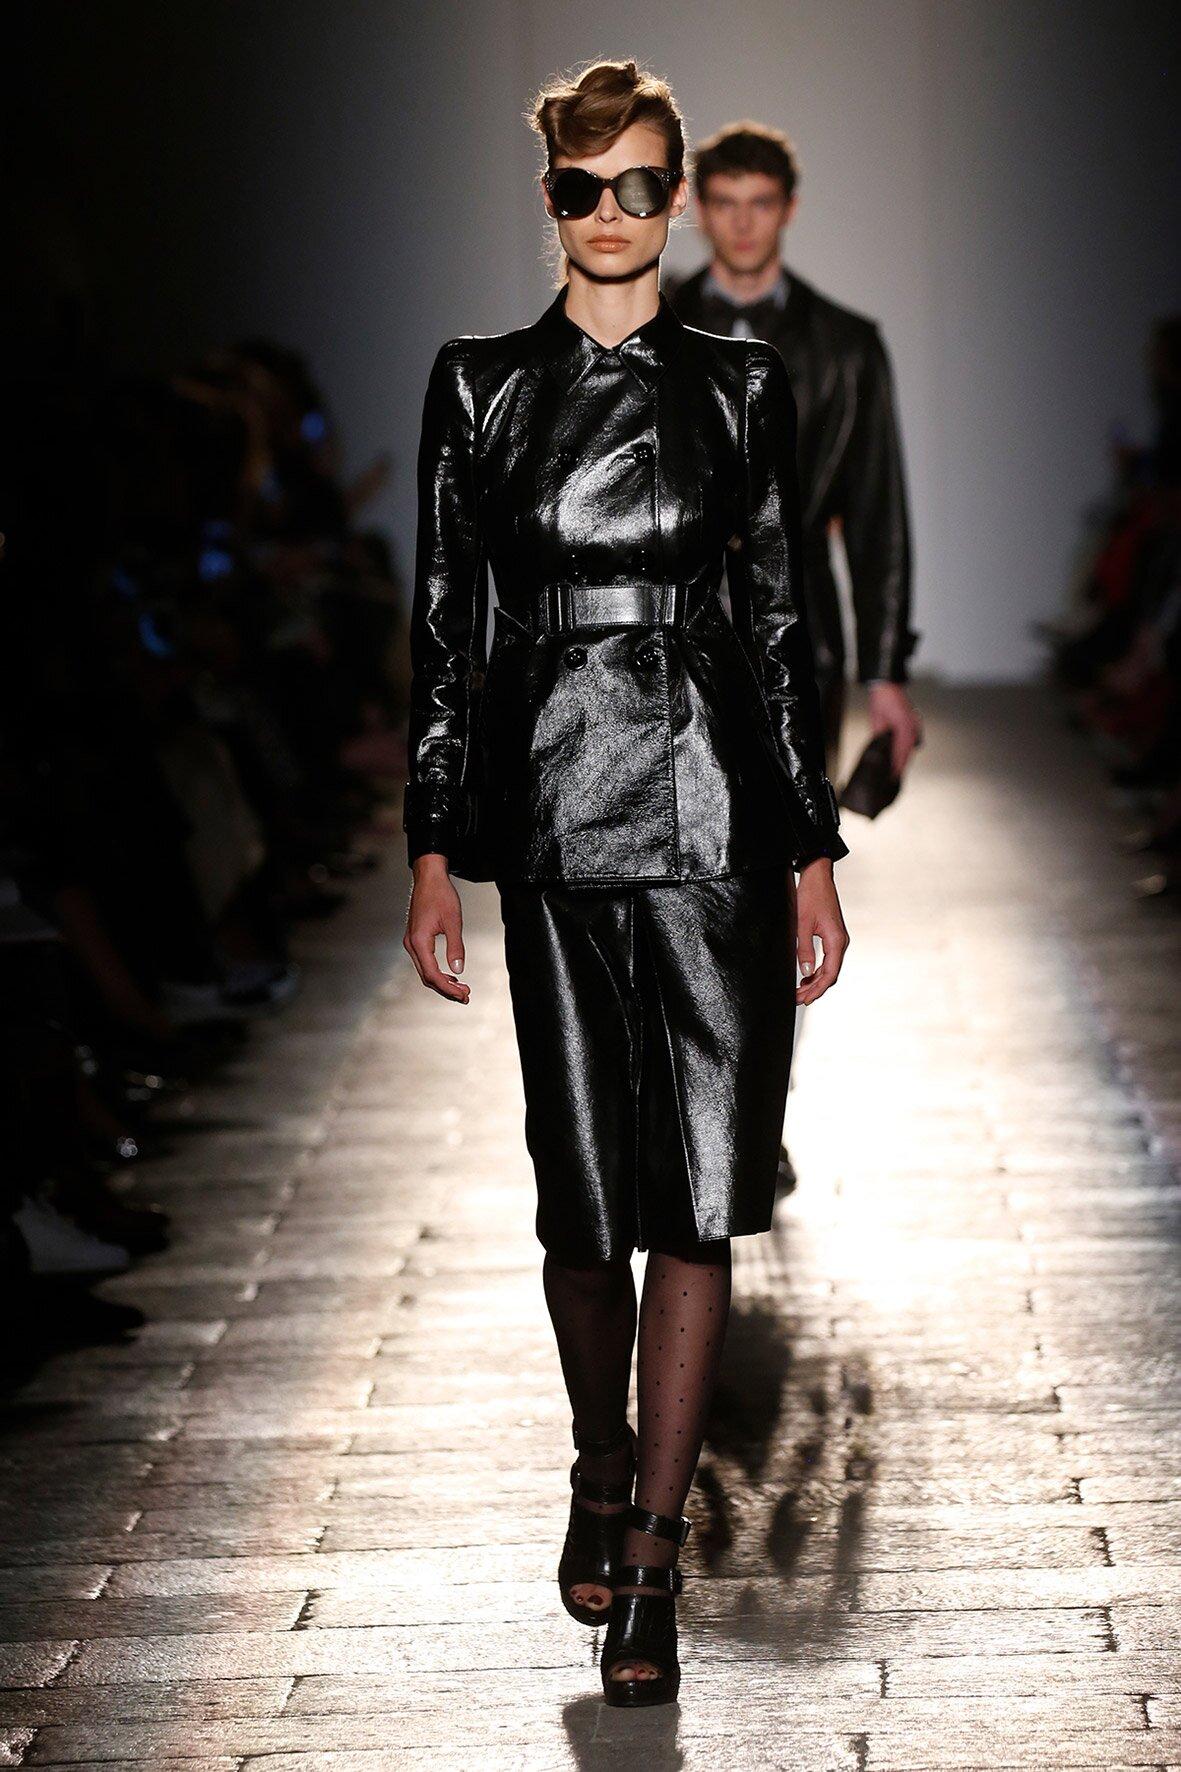 Fall Fashion Trends 2017 Bottega Veneta